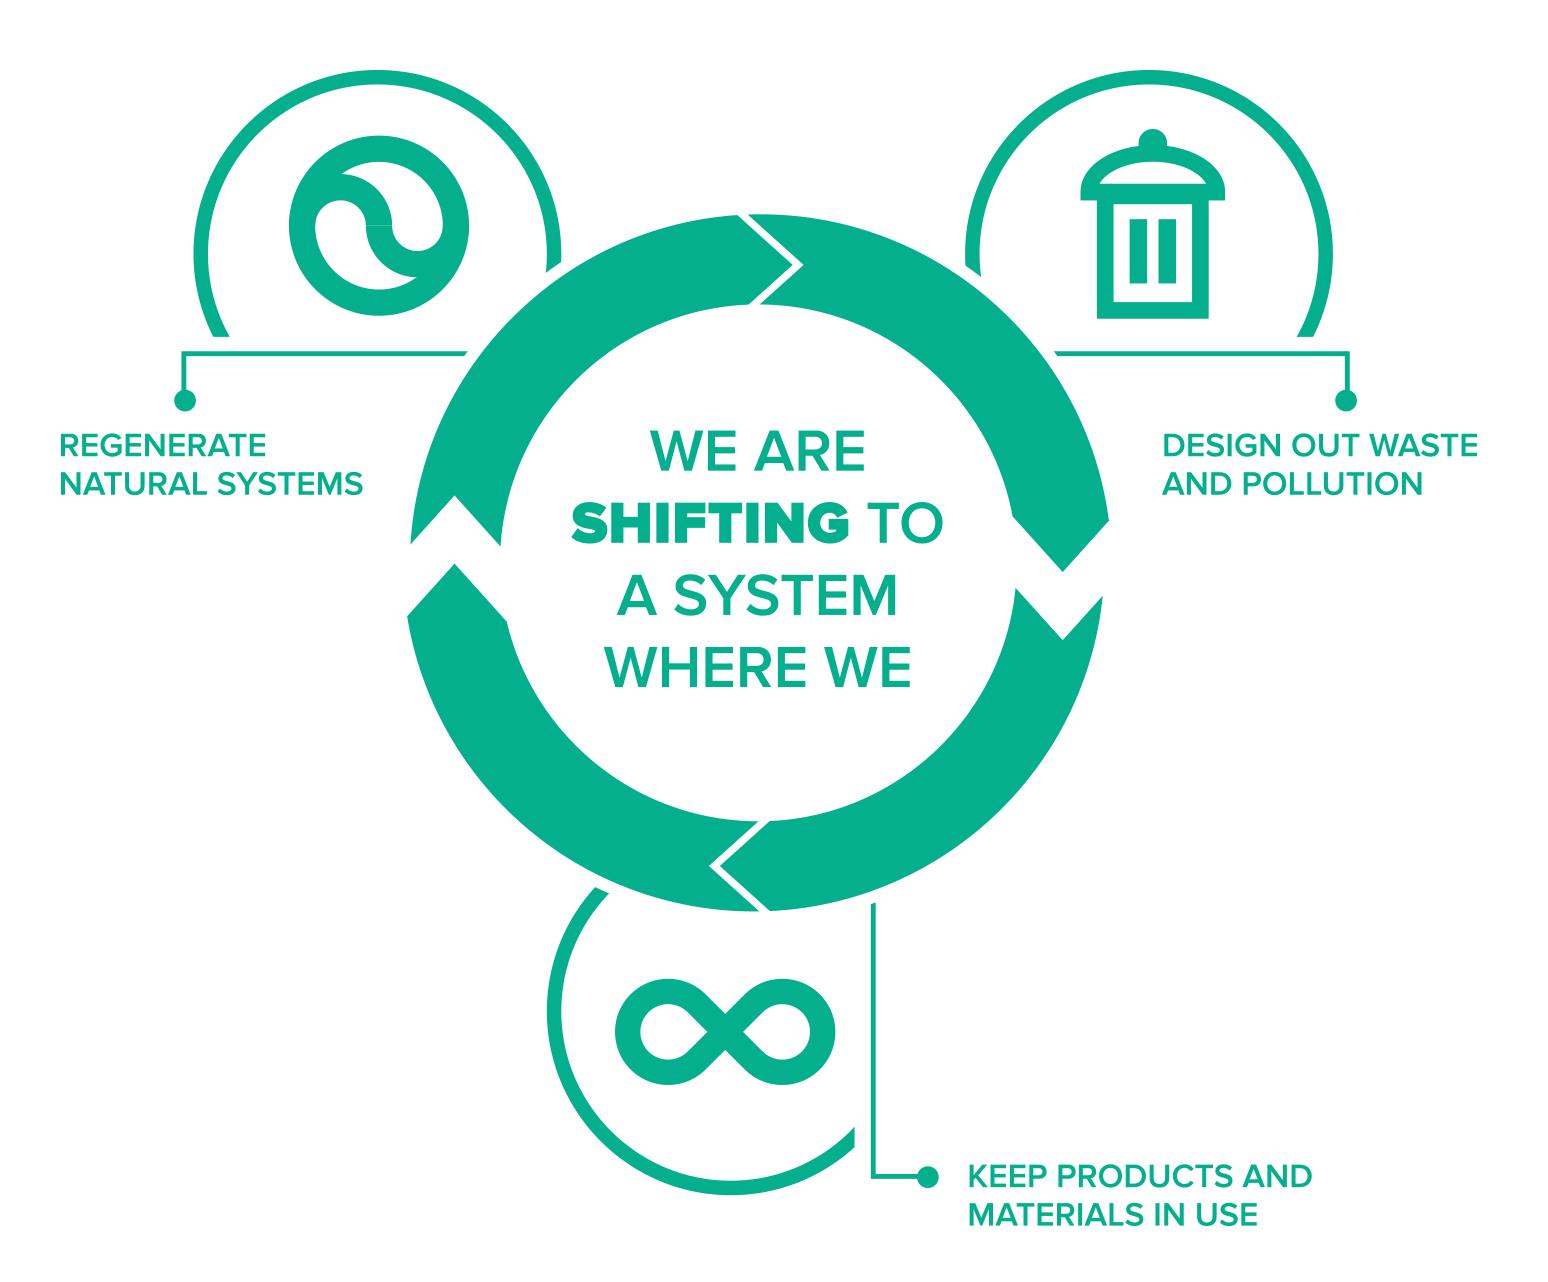 Circular economy diagram from acehub.com.au